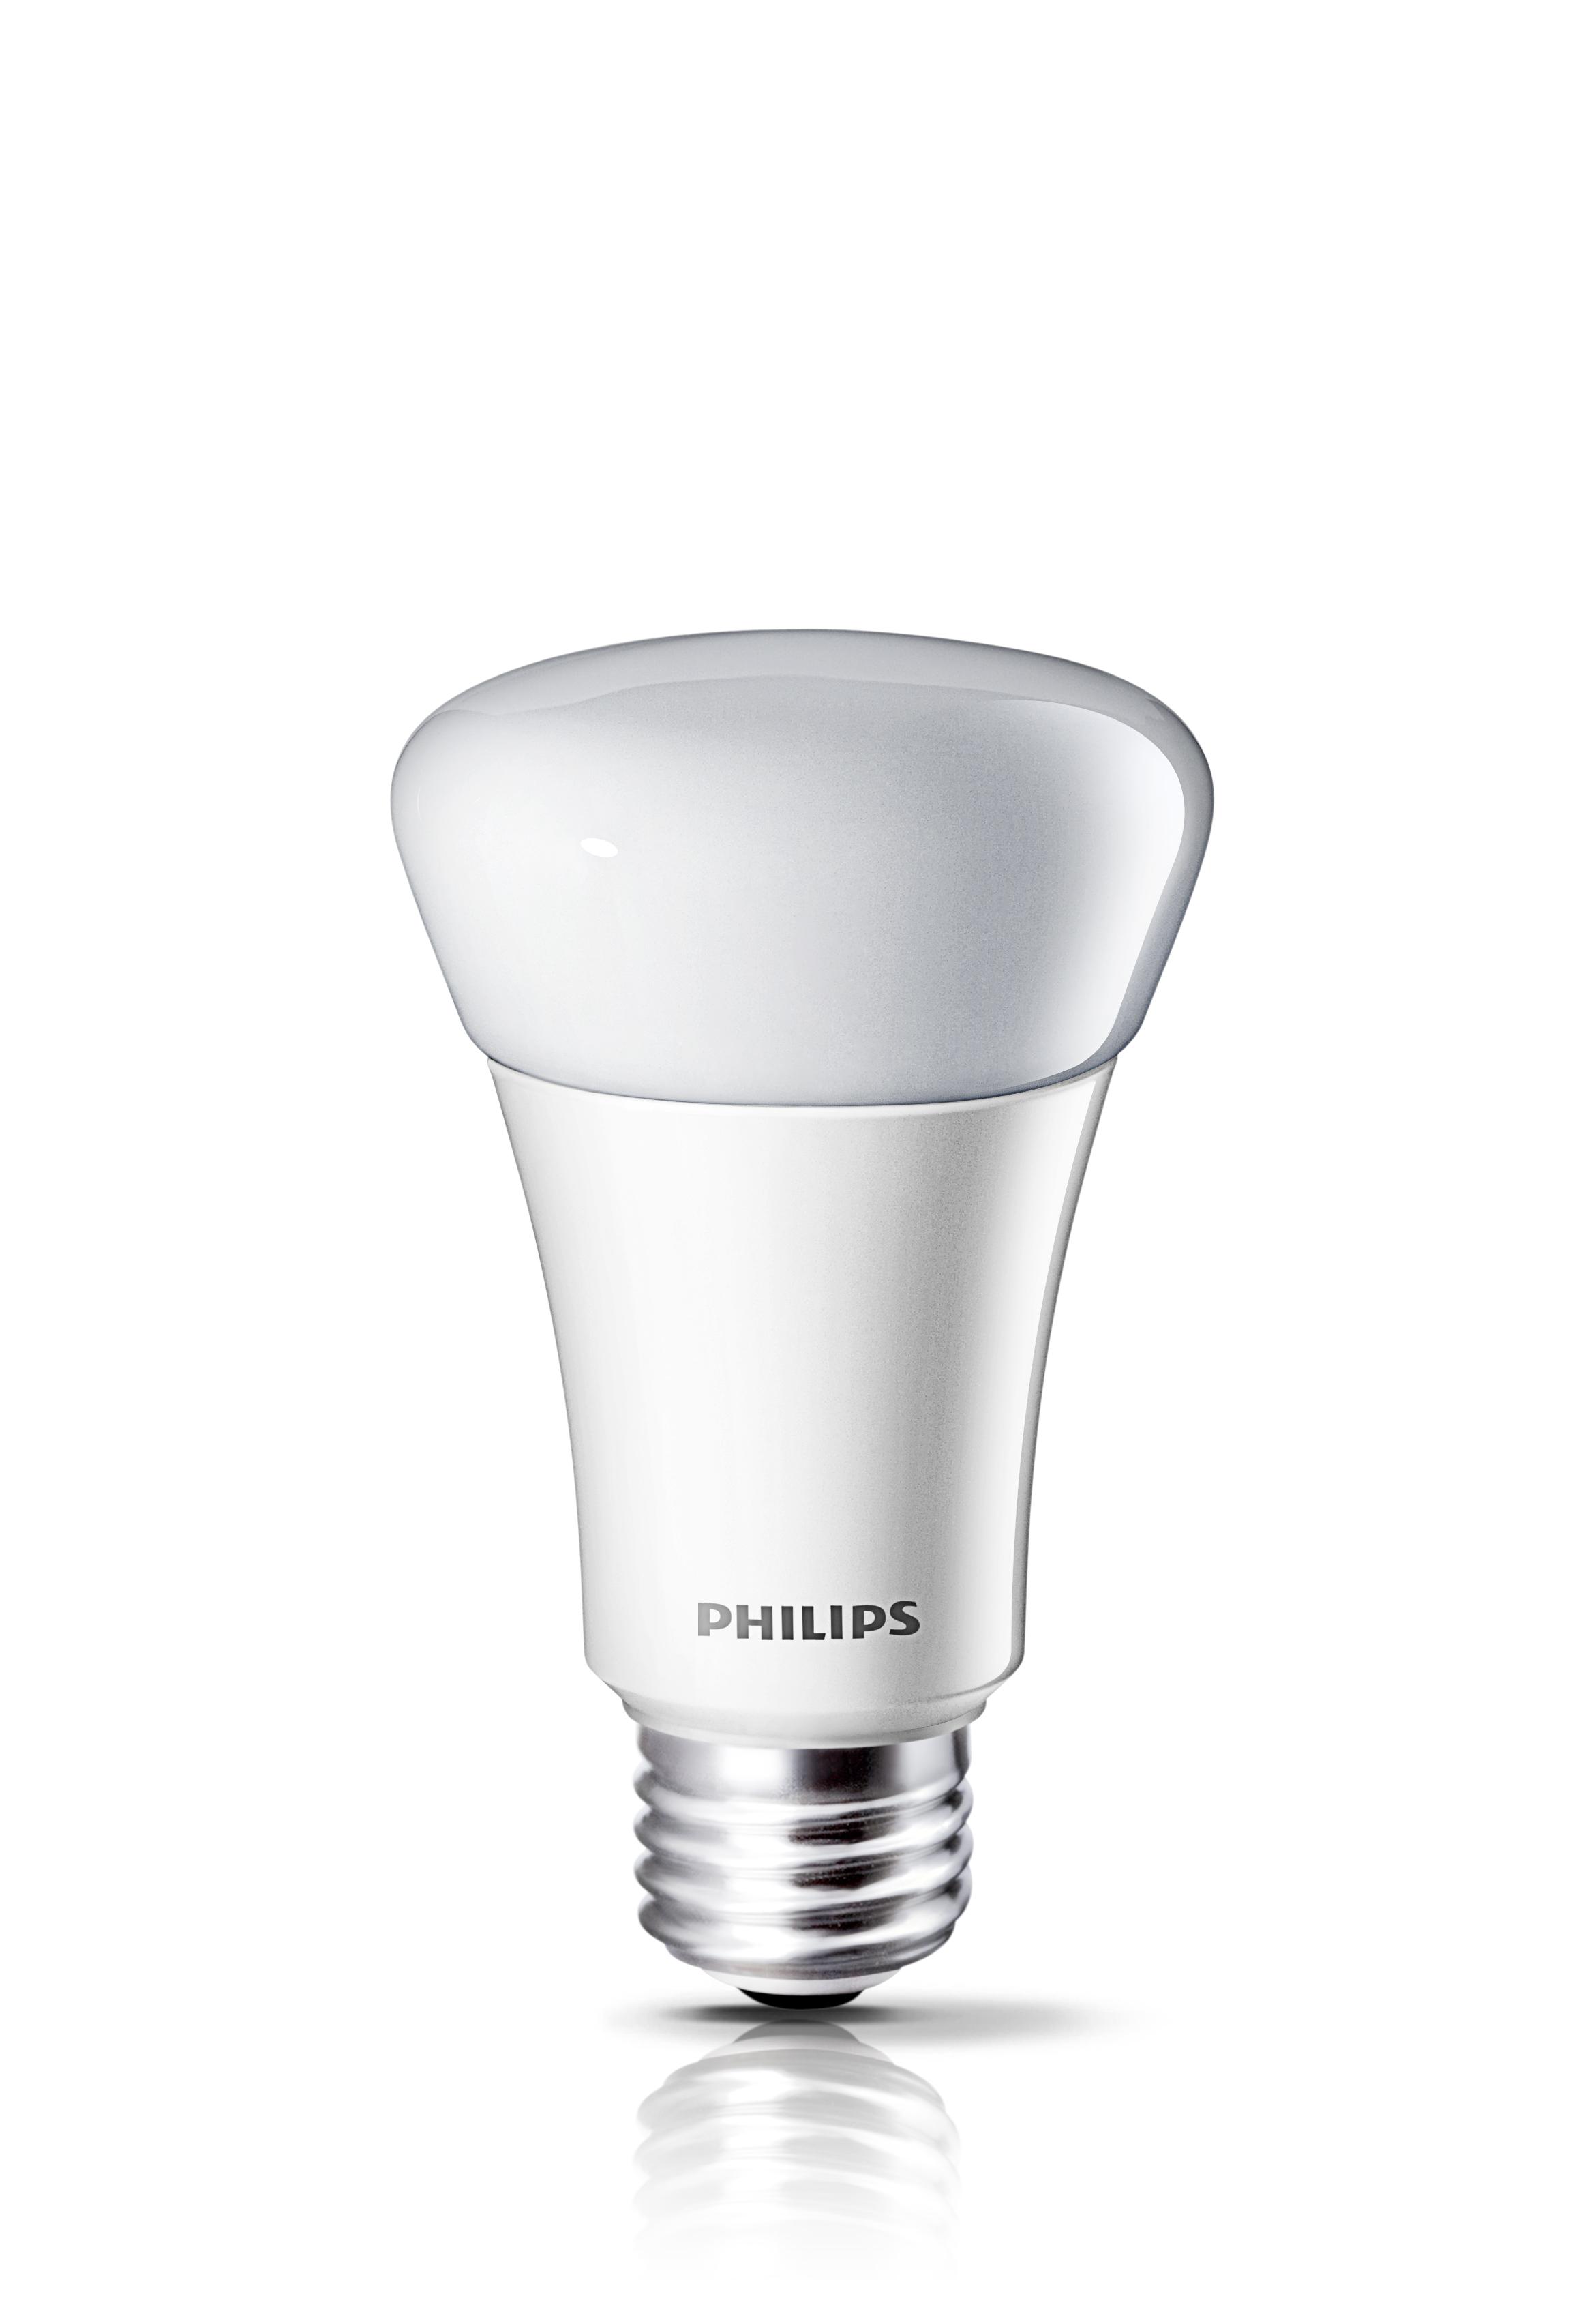 Philips' 60-Watt LED Bulb Gets a Makeover